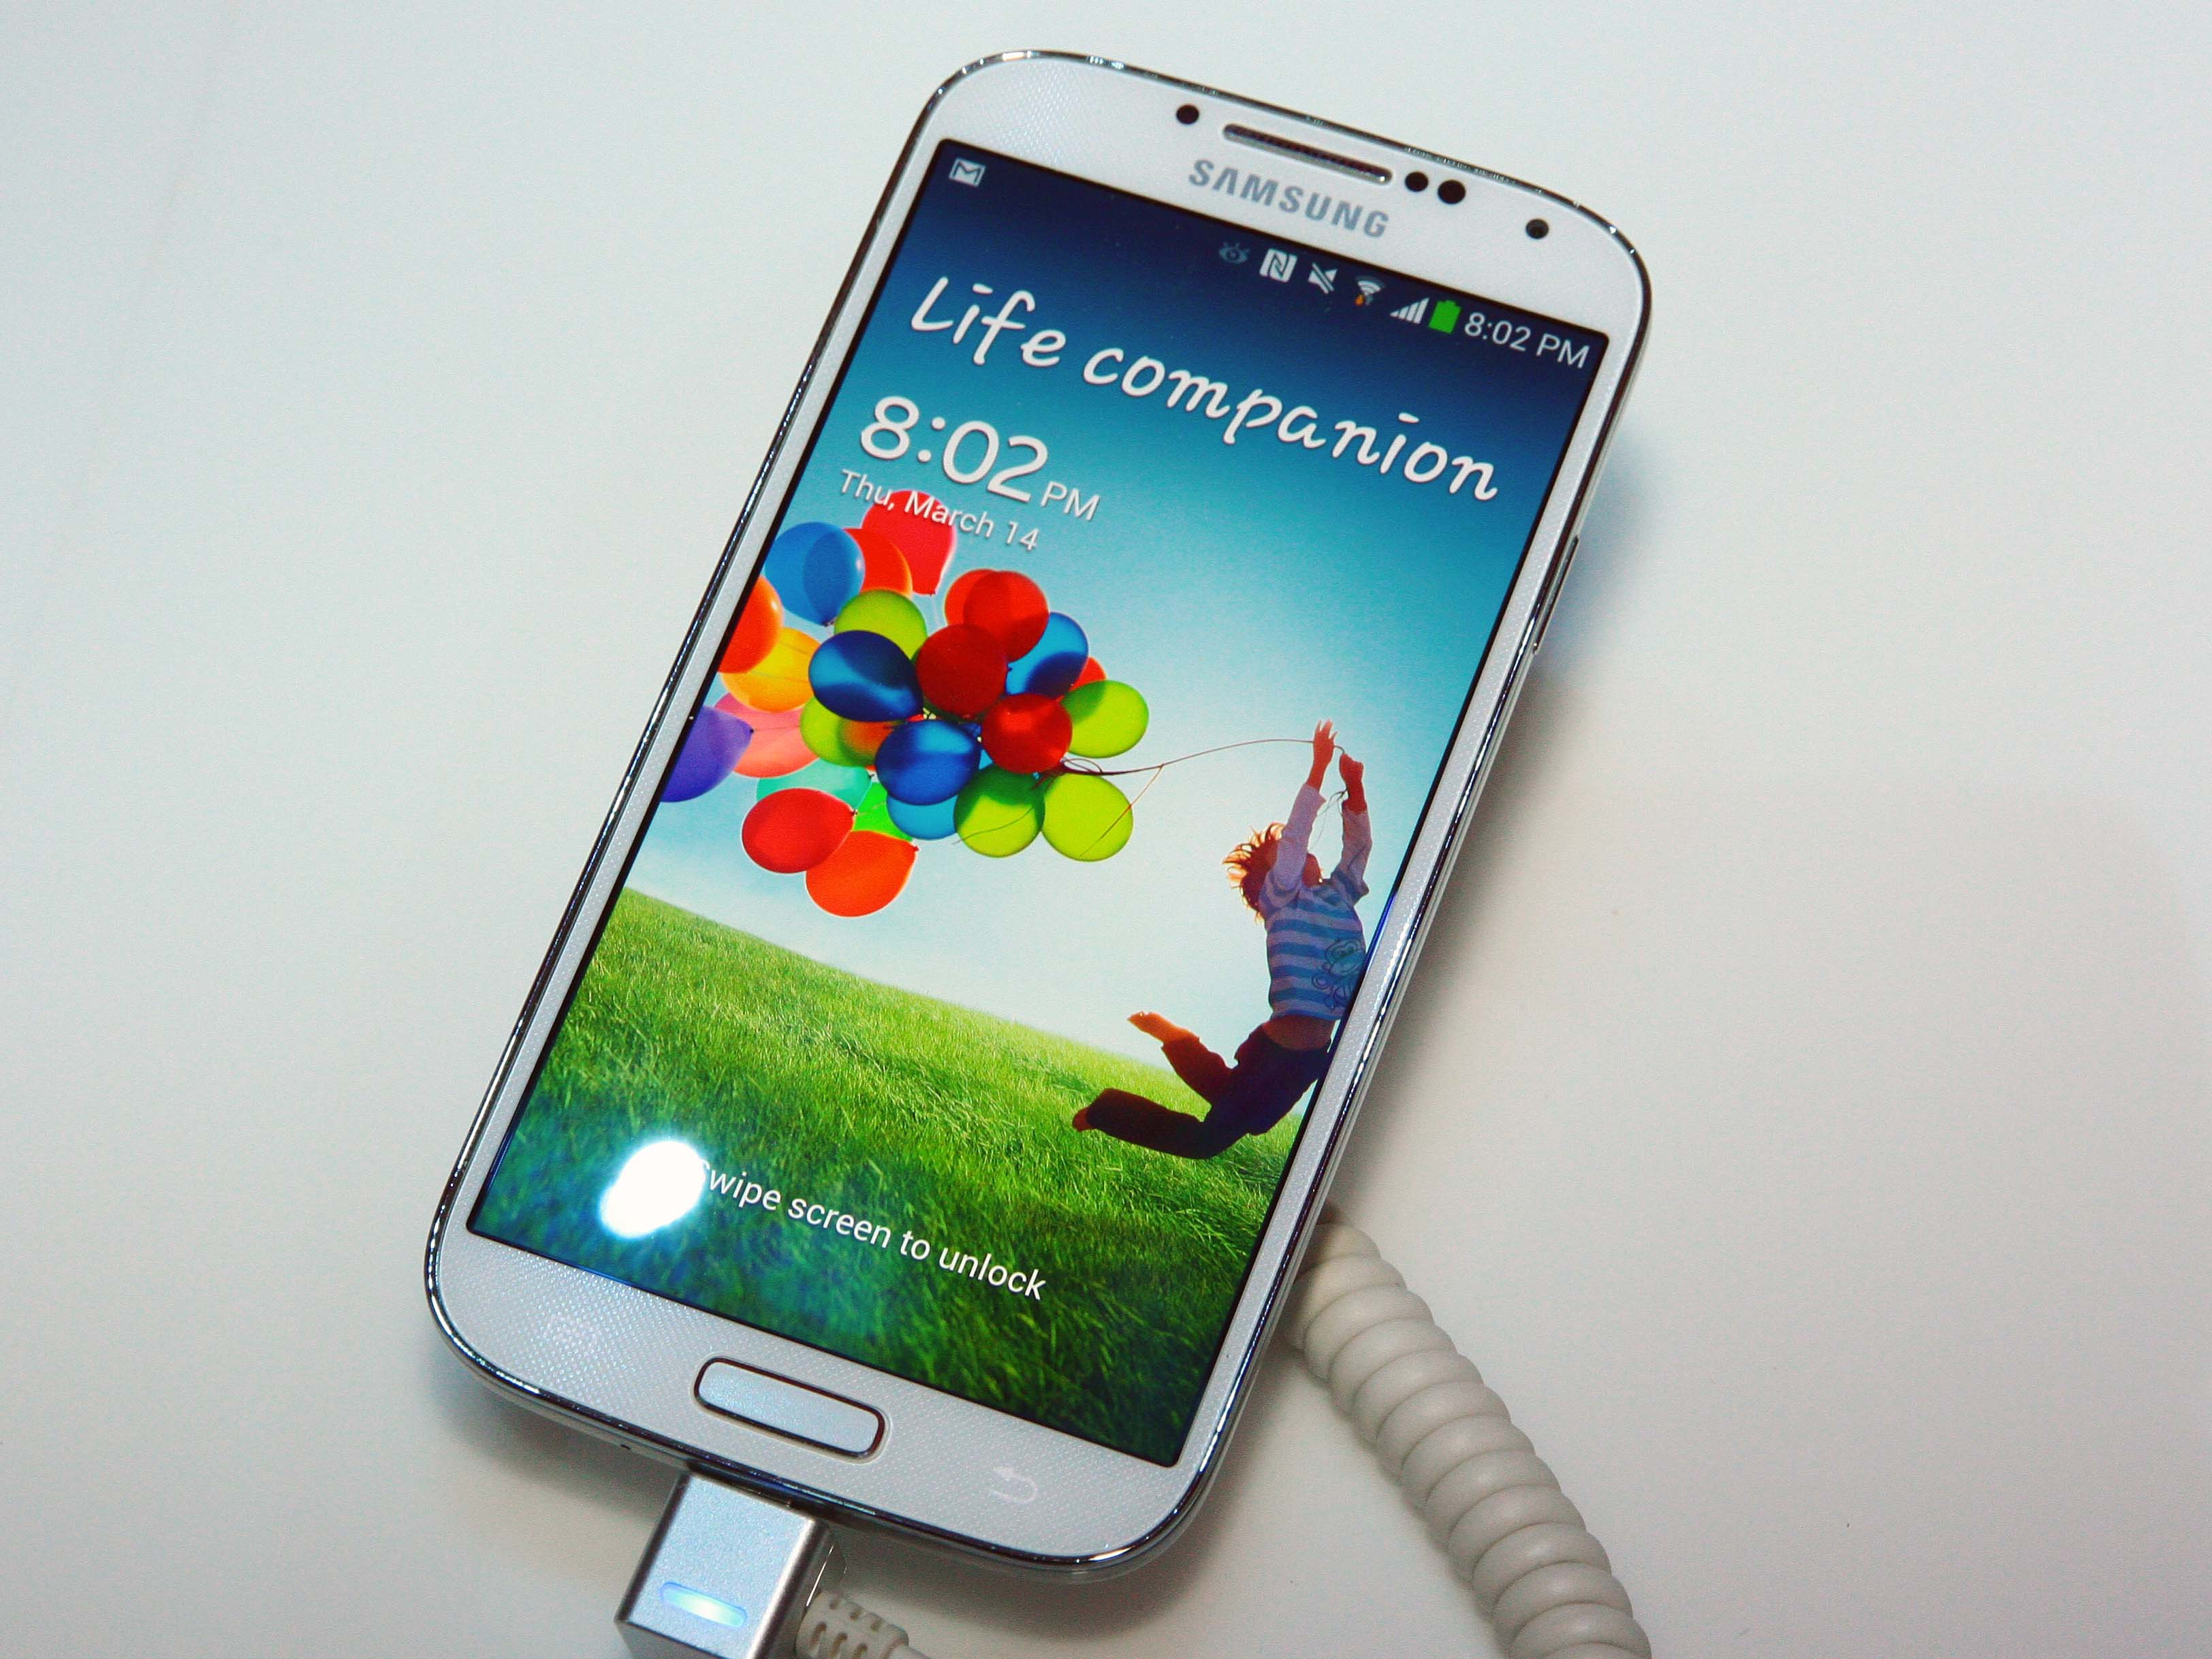 Samsung Galaxy S4 紐約現場動手玩,懸浮手勢、Smart Scroll 徹底體驗